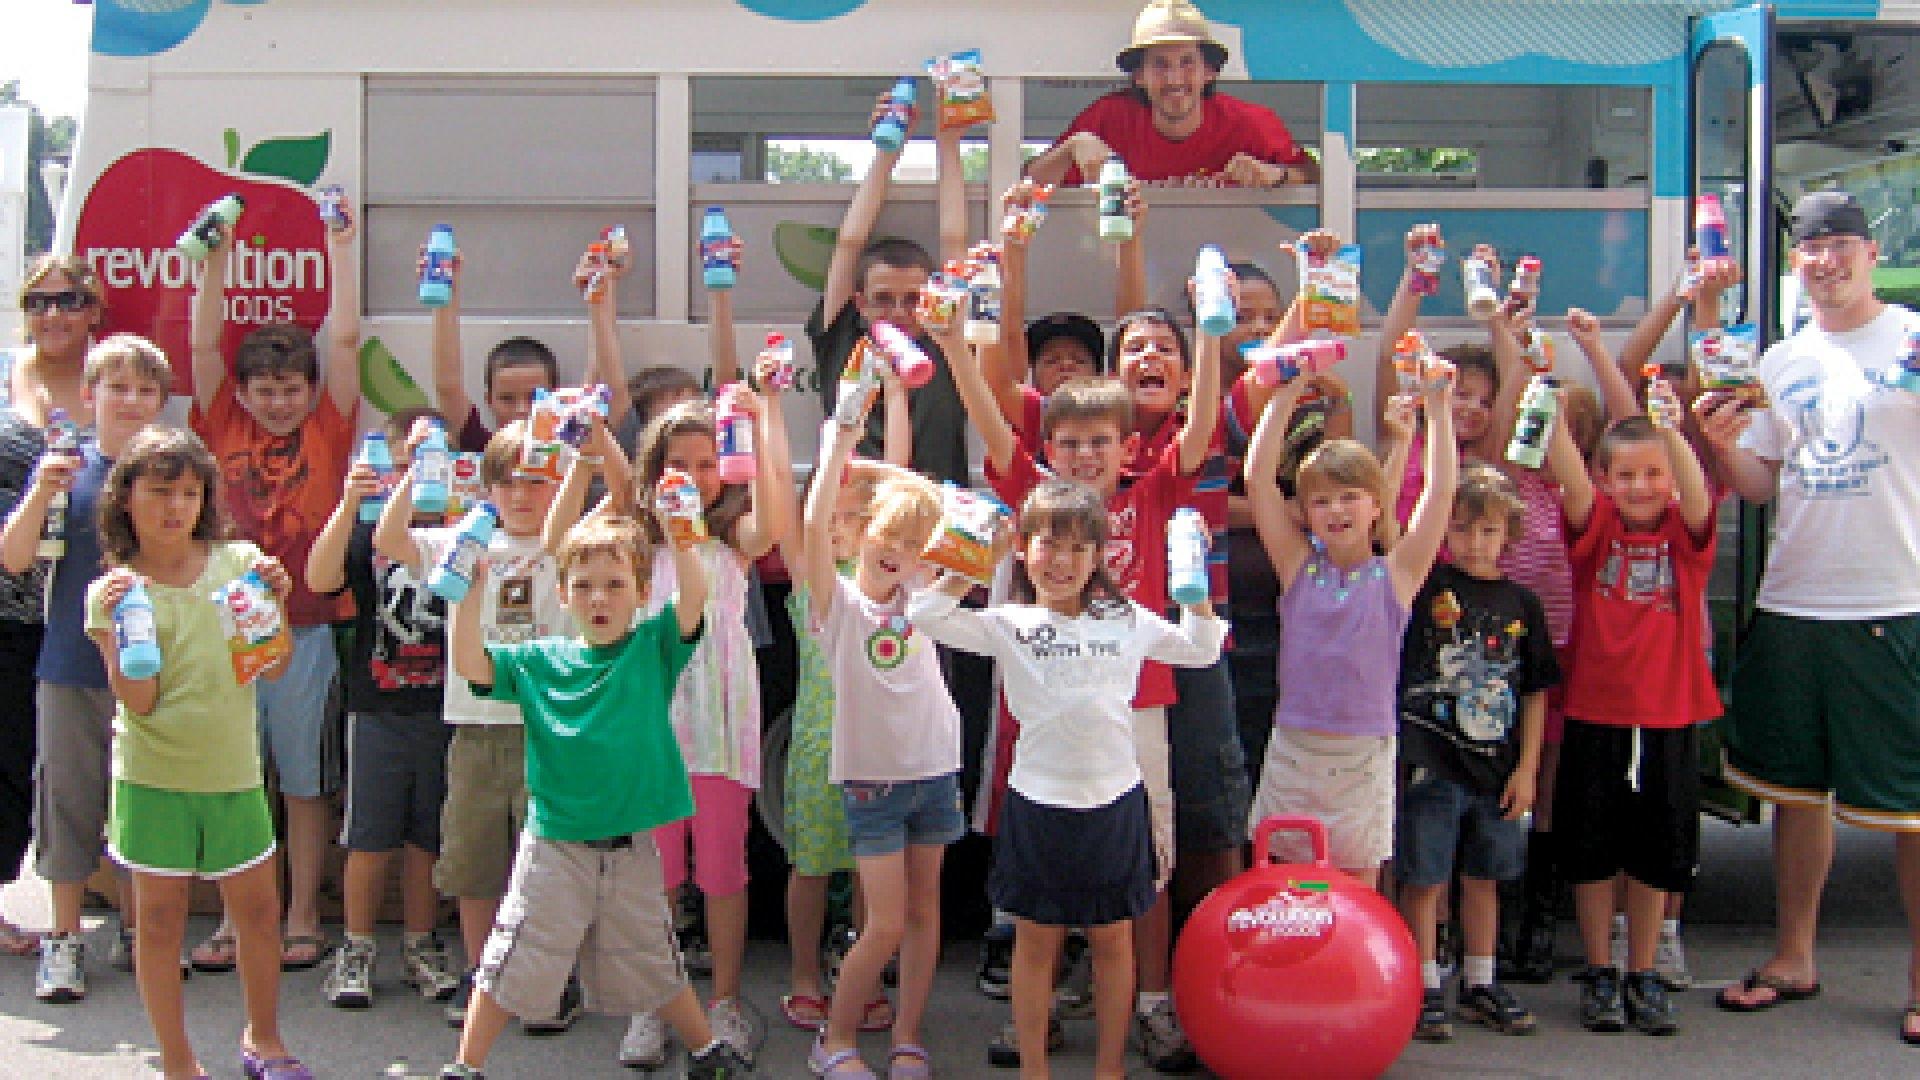 Revolution Foods Summer Tour 2009